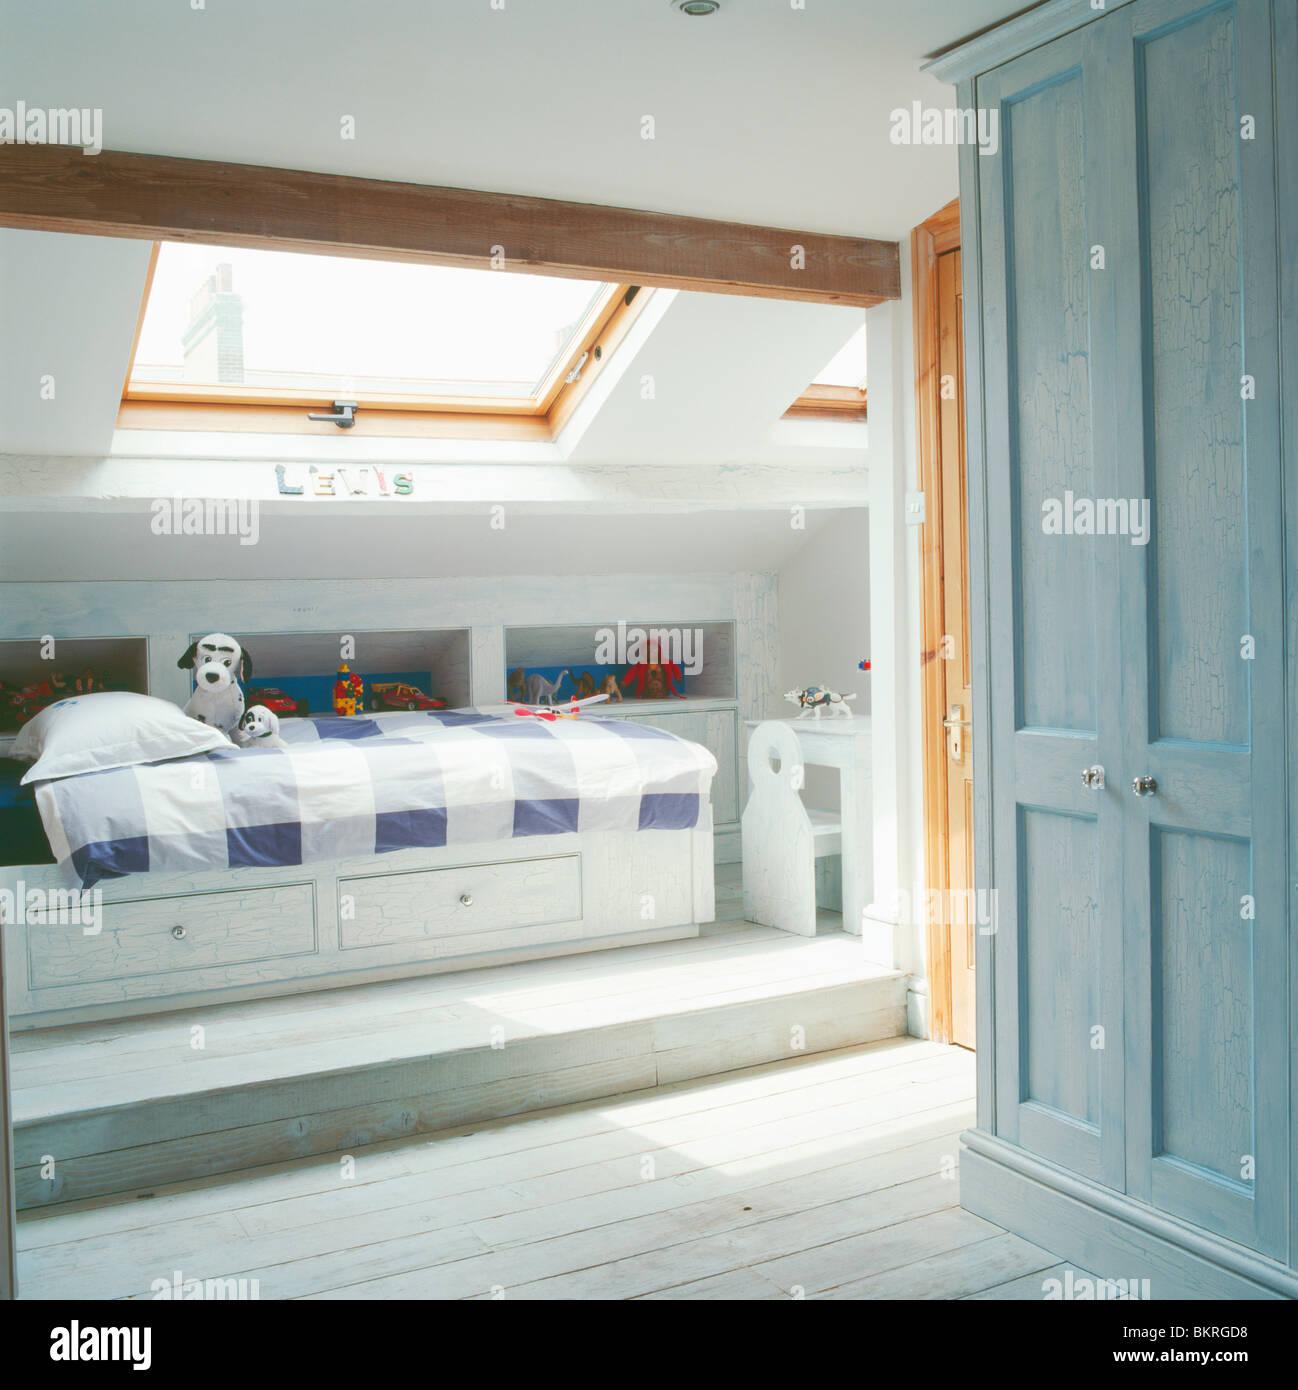 bedroom with velux windows stockfotos bedroom with velux windows bilder alamy. Black Bedroom Furniture Sets. Home Design Ideas